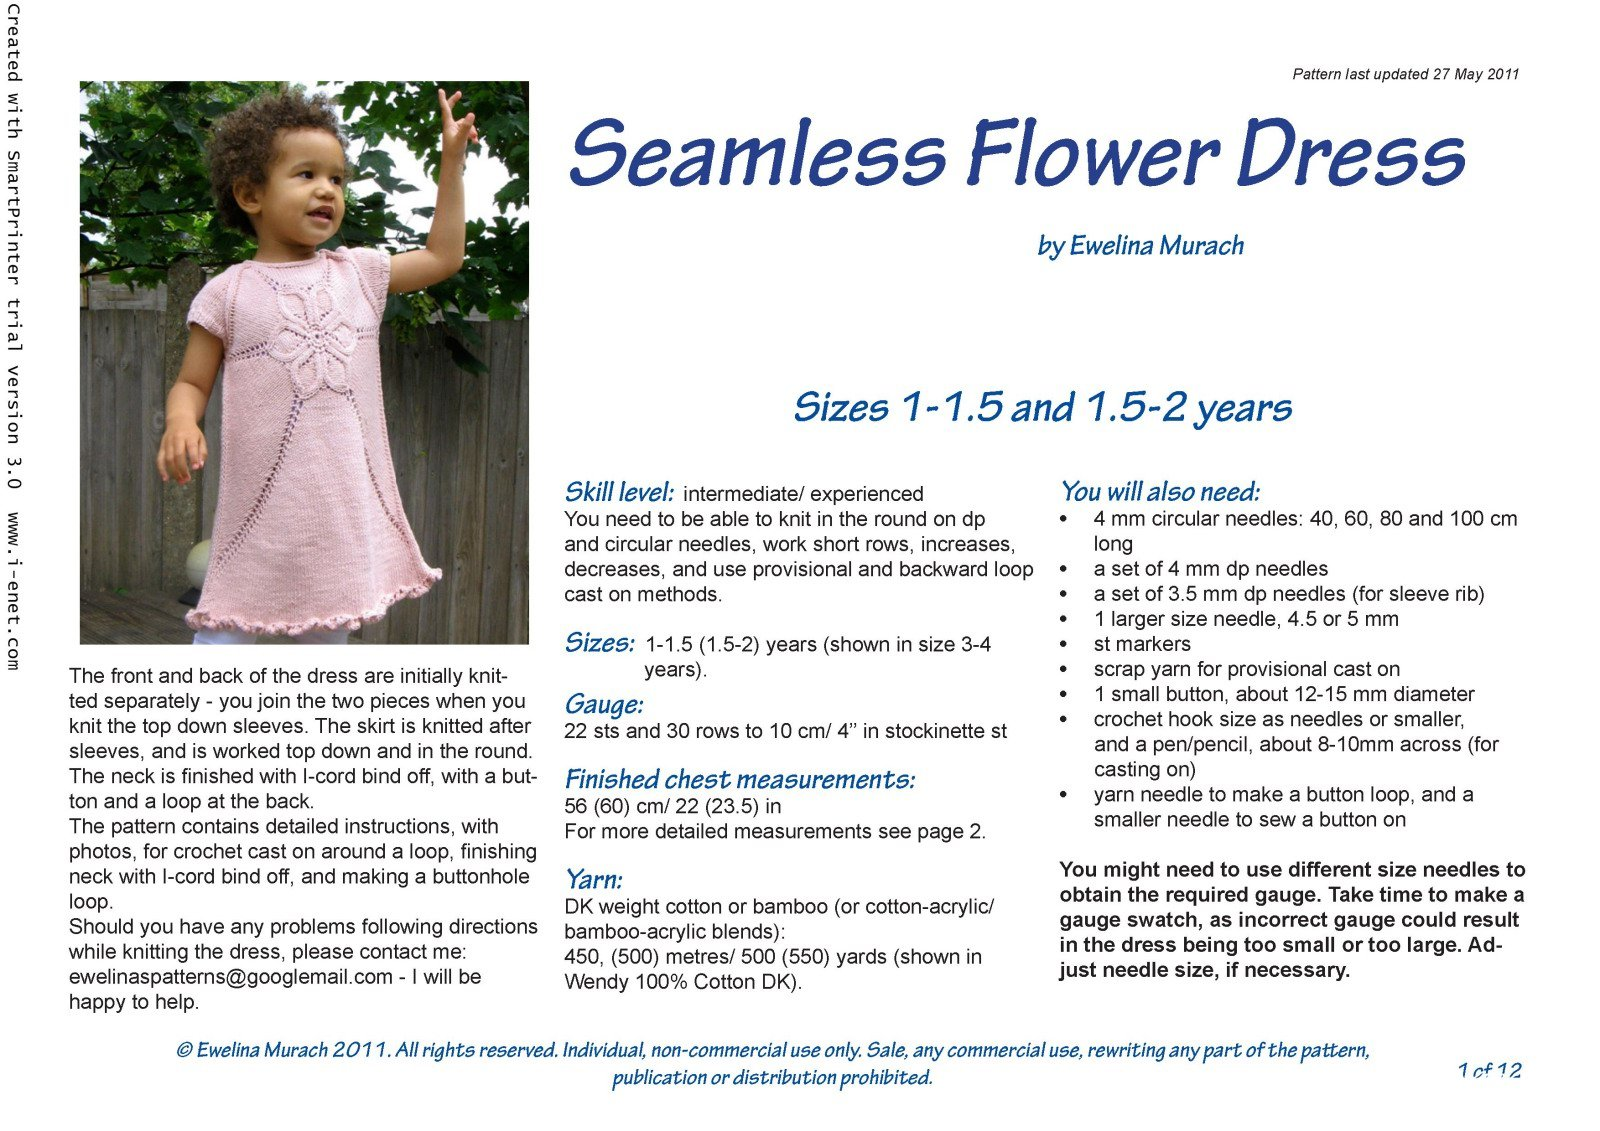 Seamless Flower Dress sizes 1-2 years FV____1.jpg